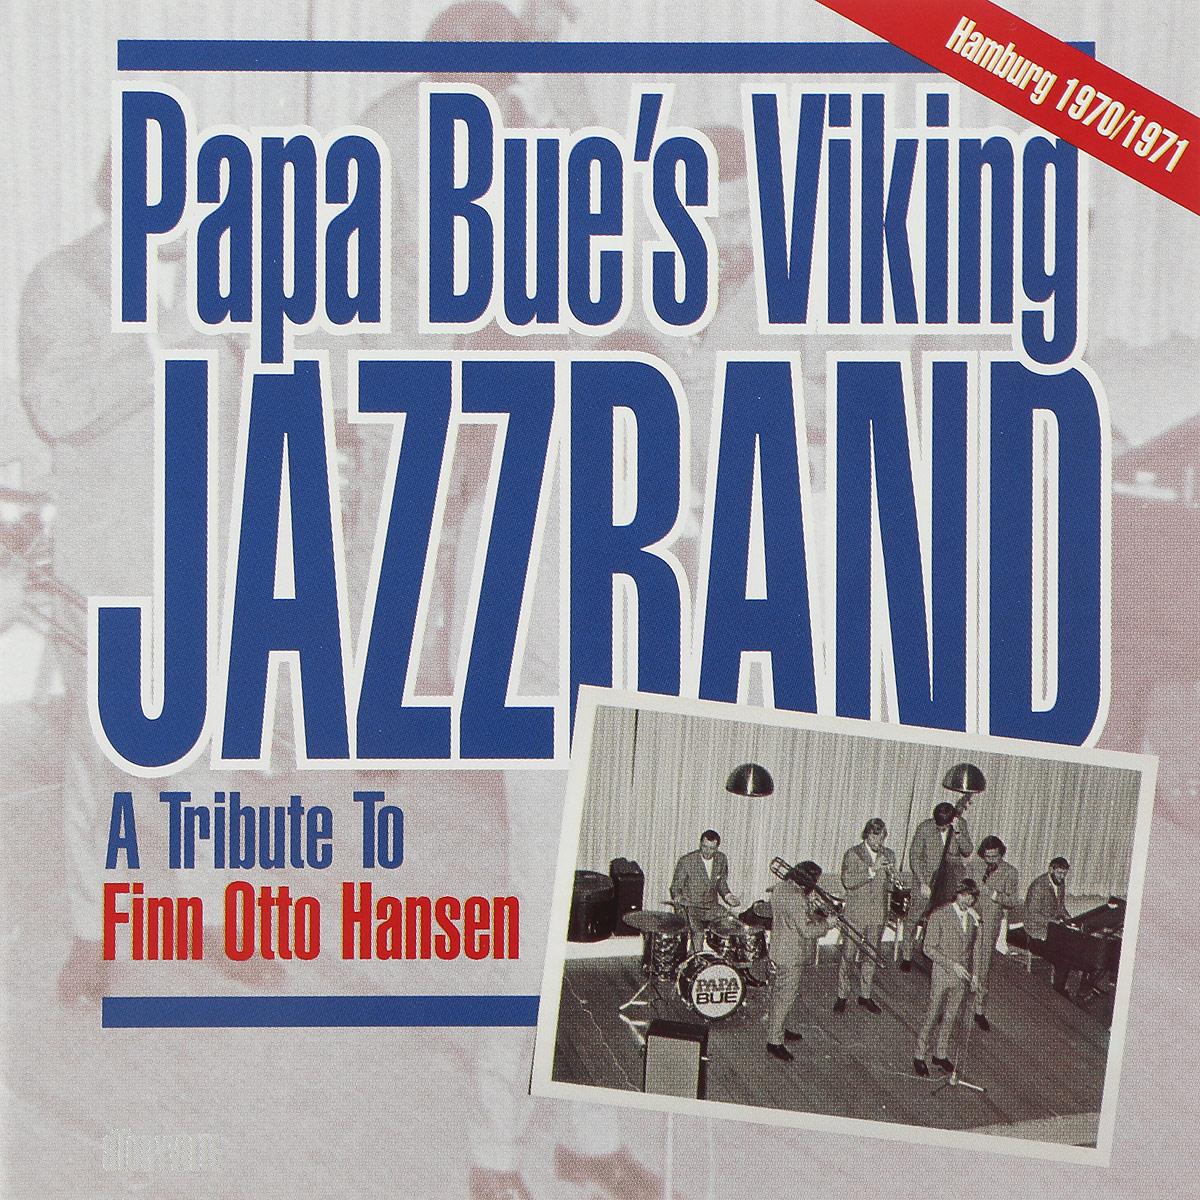 Papa Bue's Viking Jazz Band Papa Bue's Viking Jazzband. A Tribute To Finn Otto Hansen. Hamburg 1970-1971 münchner philharmoniker elbphilharmonie hamburg